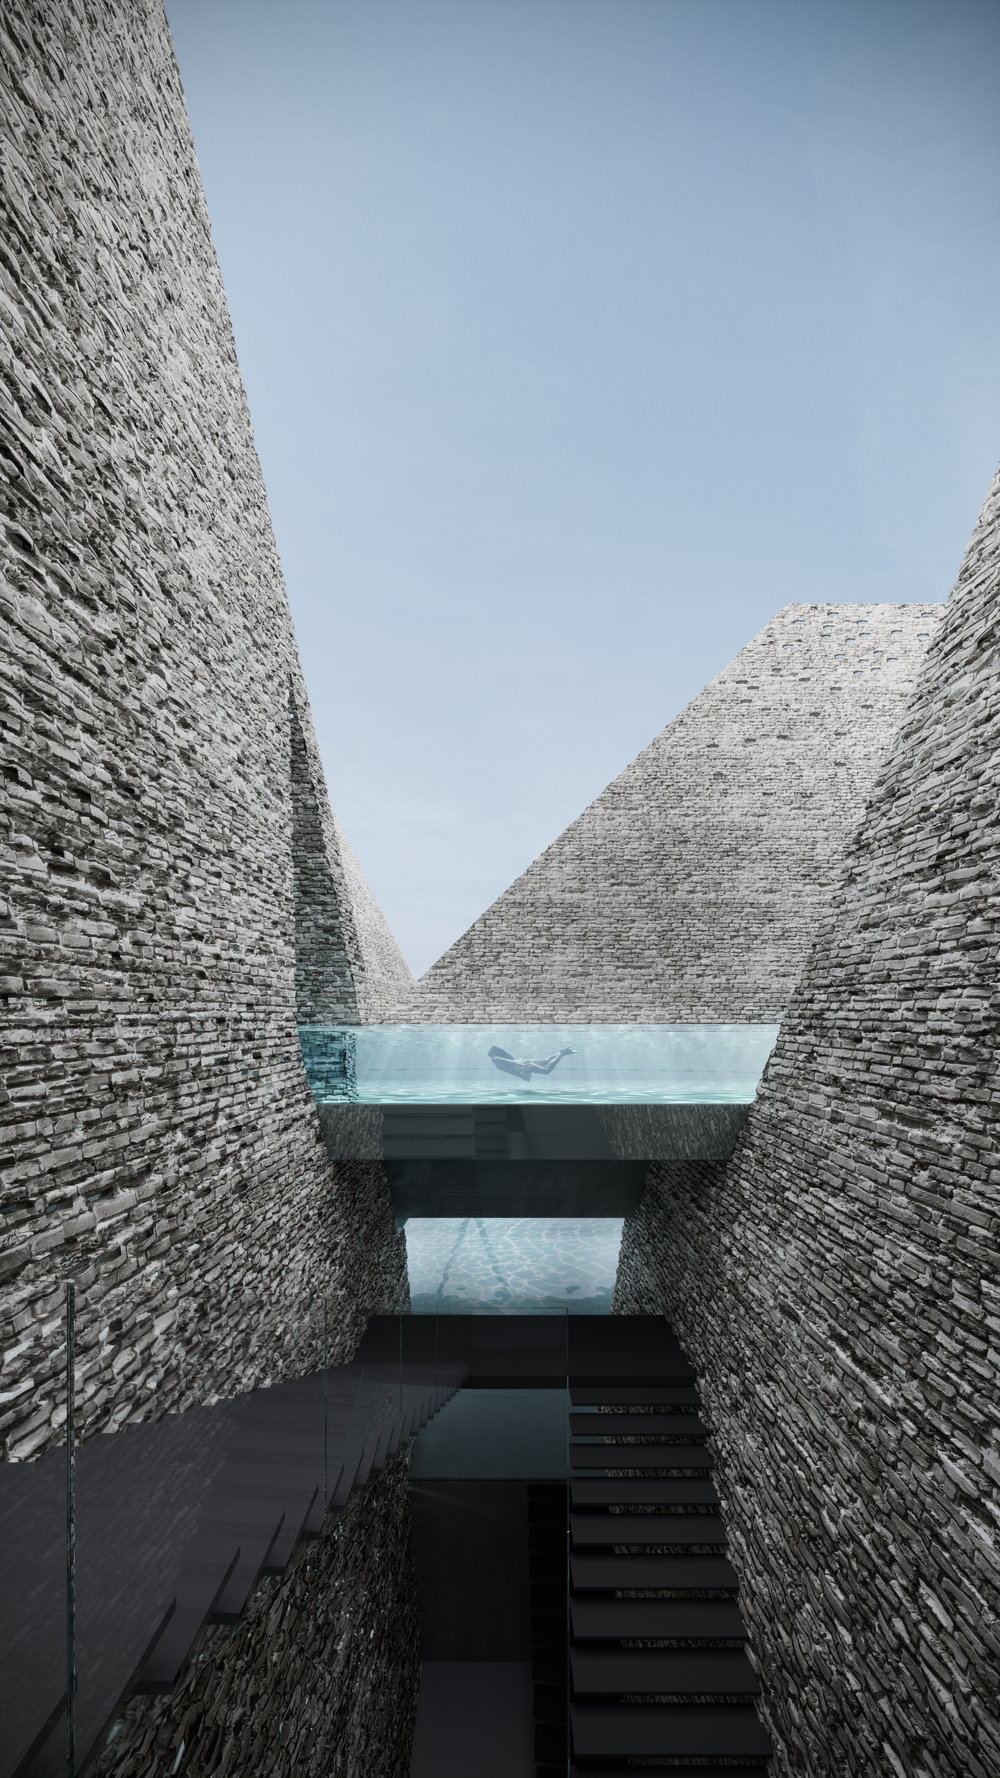 The design includes a landscape of brick pyramids.